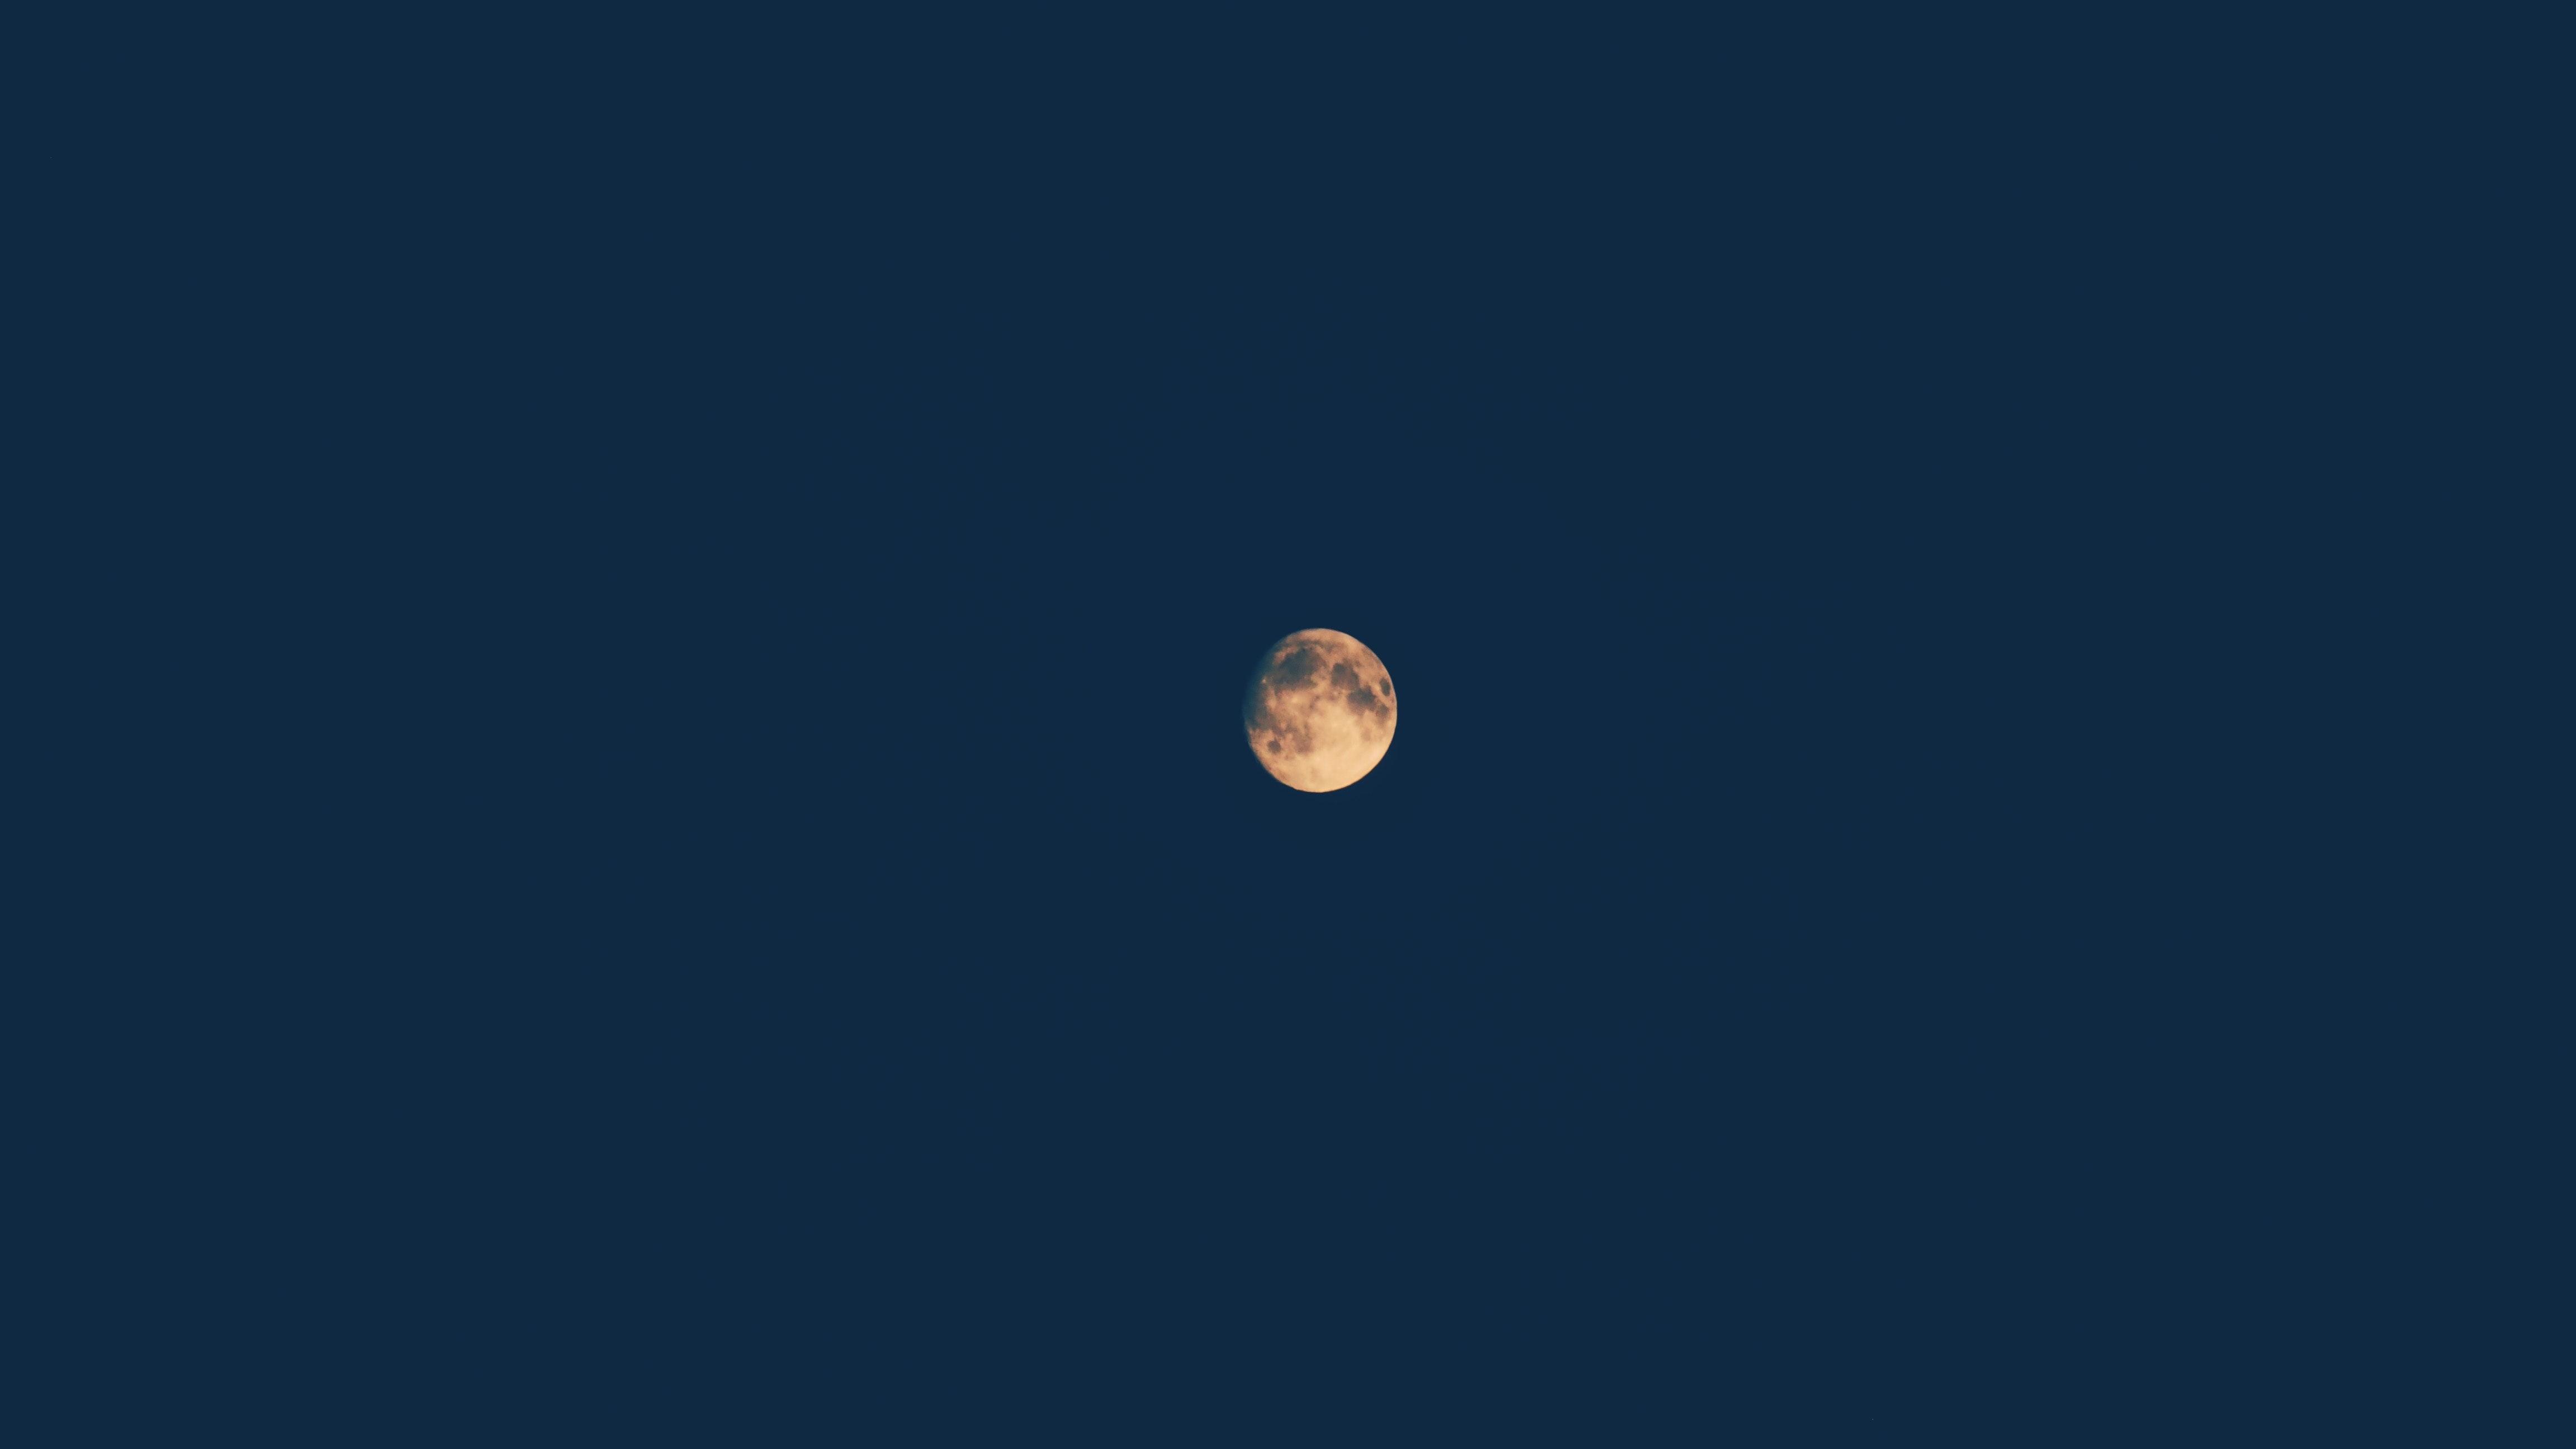 Full Moon Illustration, Astronomy, Ball-shaped, Dark, Full moon, HQ Photo